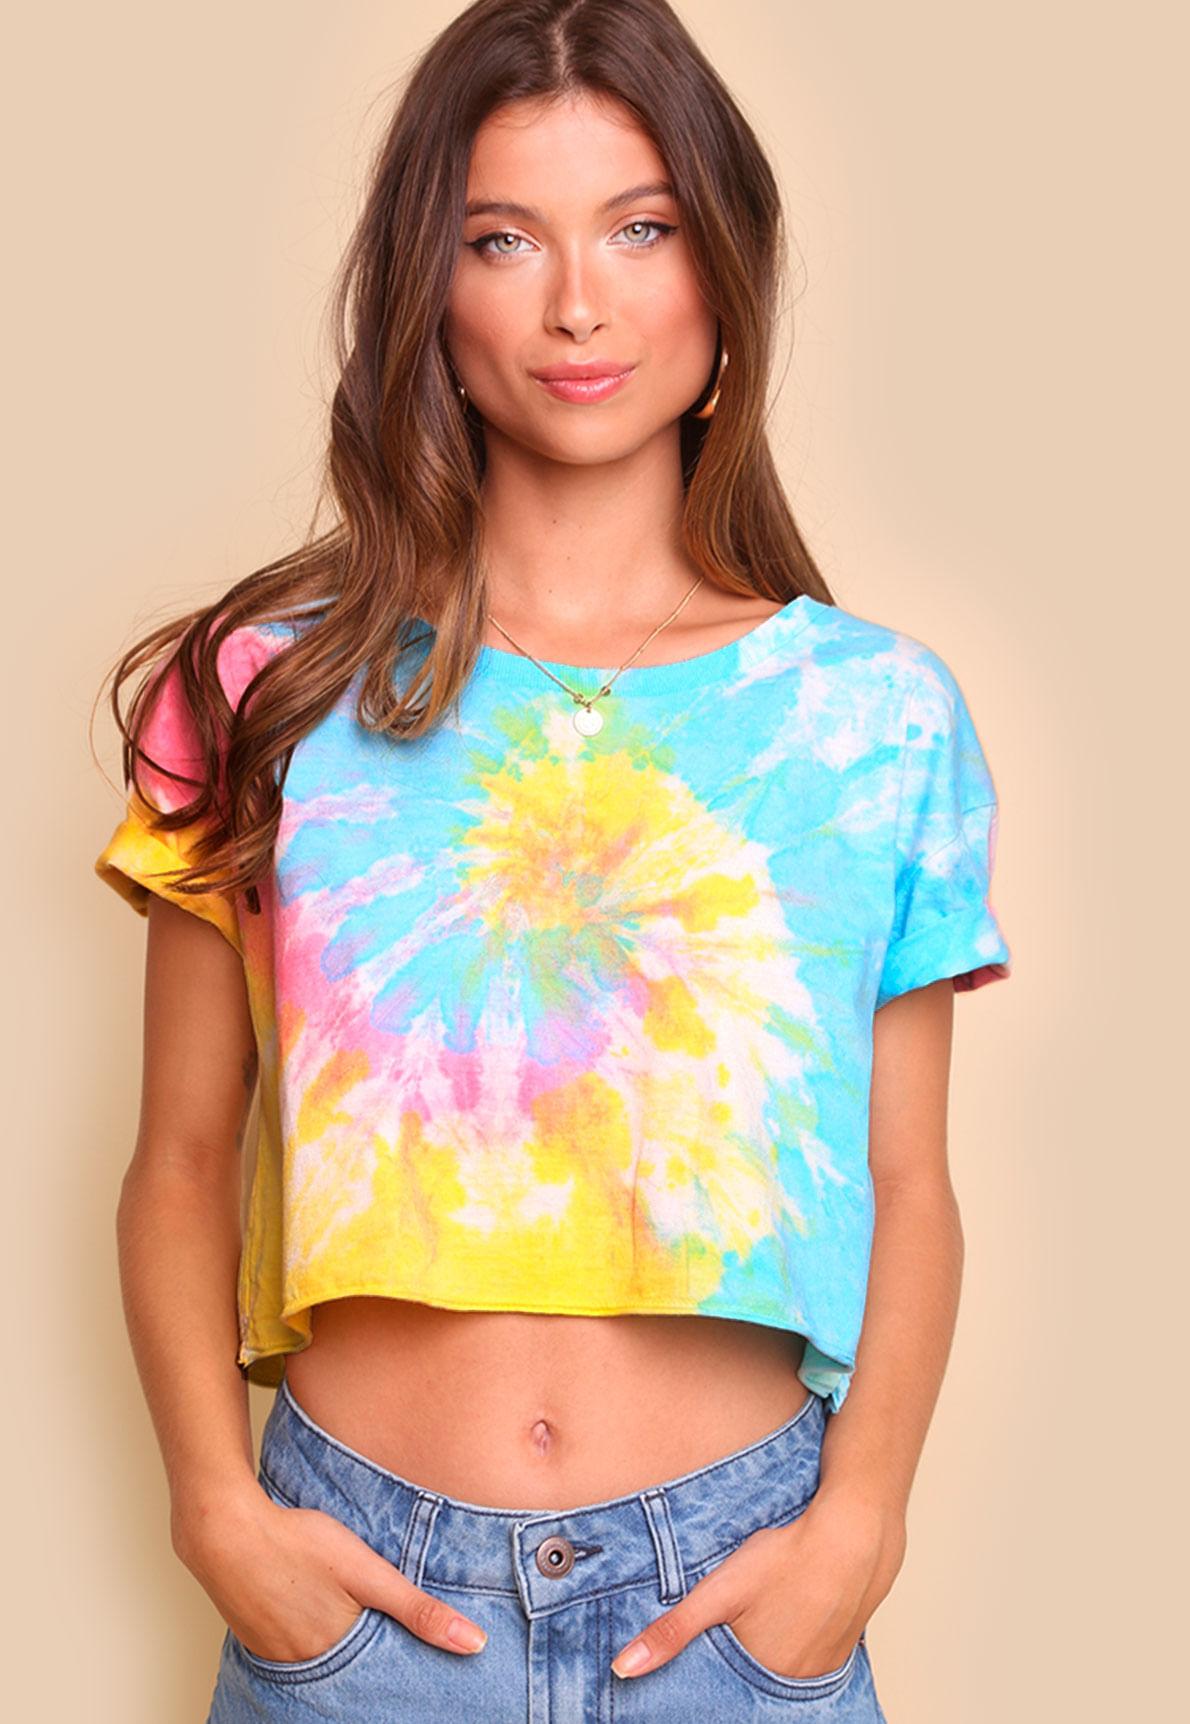 29763-T-Shirt-Mundo-Lolita-Feminina-Cropped-Tie-Dye-Lola-01